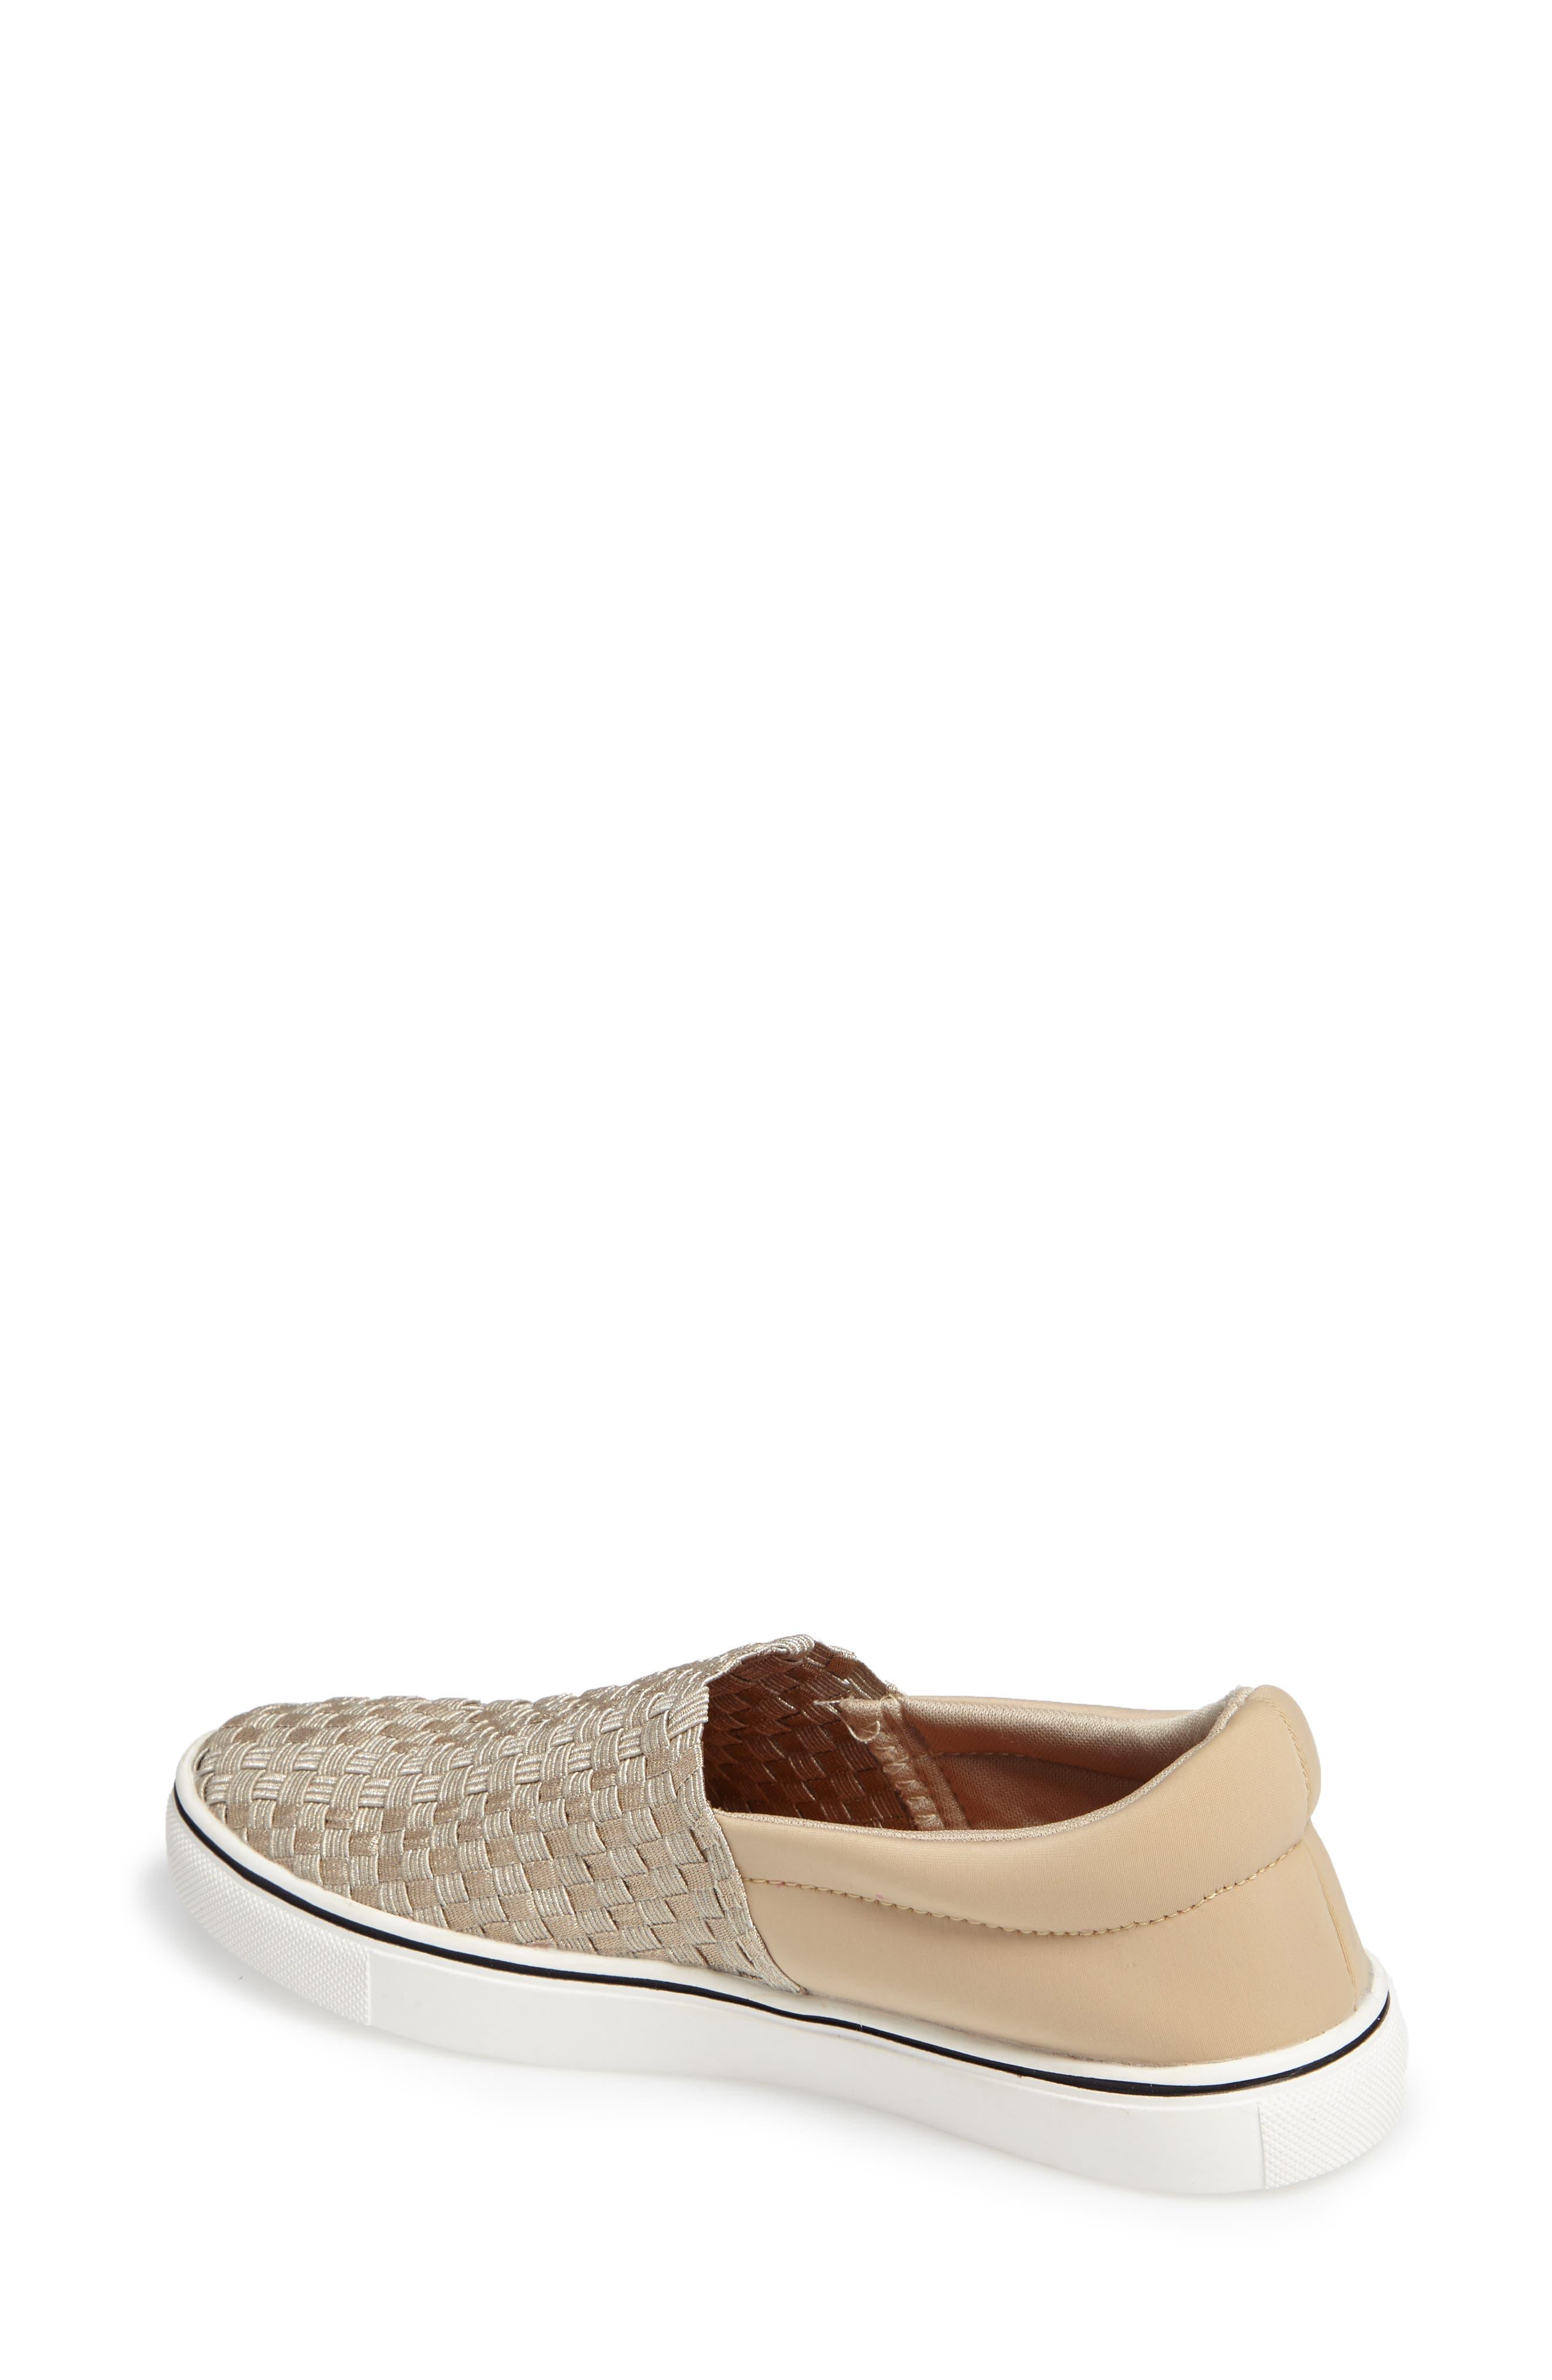 Ofelia Woven Elastic Sneaker,                             Alternate thumbnail 2, color,                             Light Gold Fabric